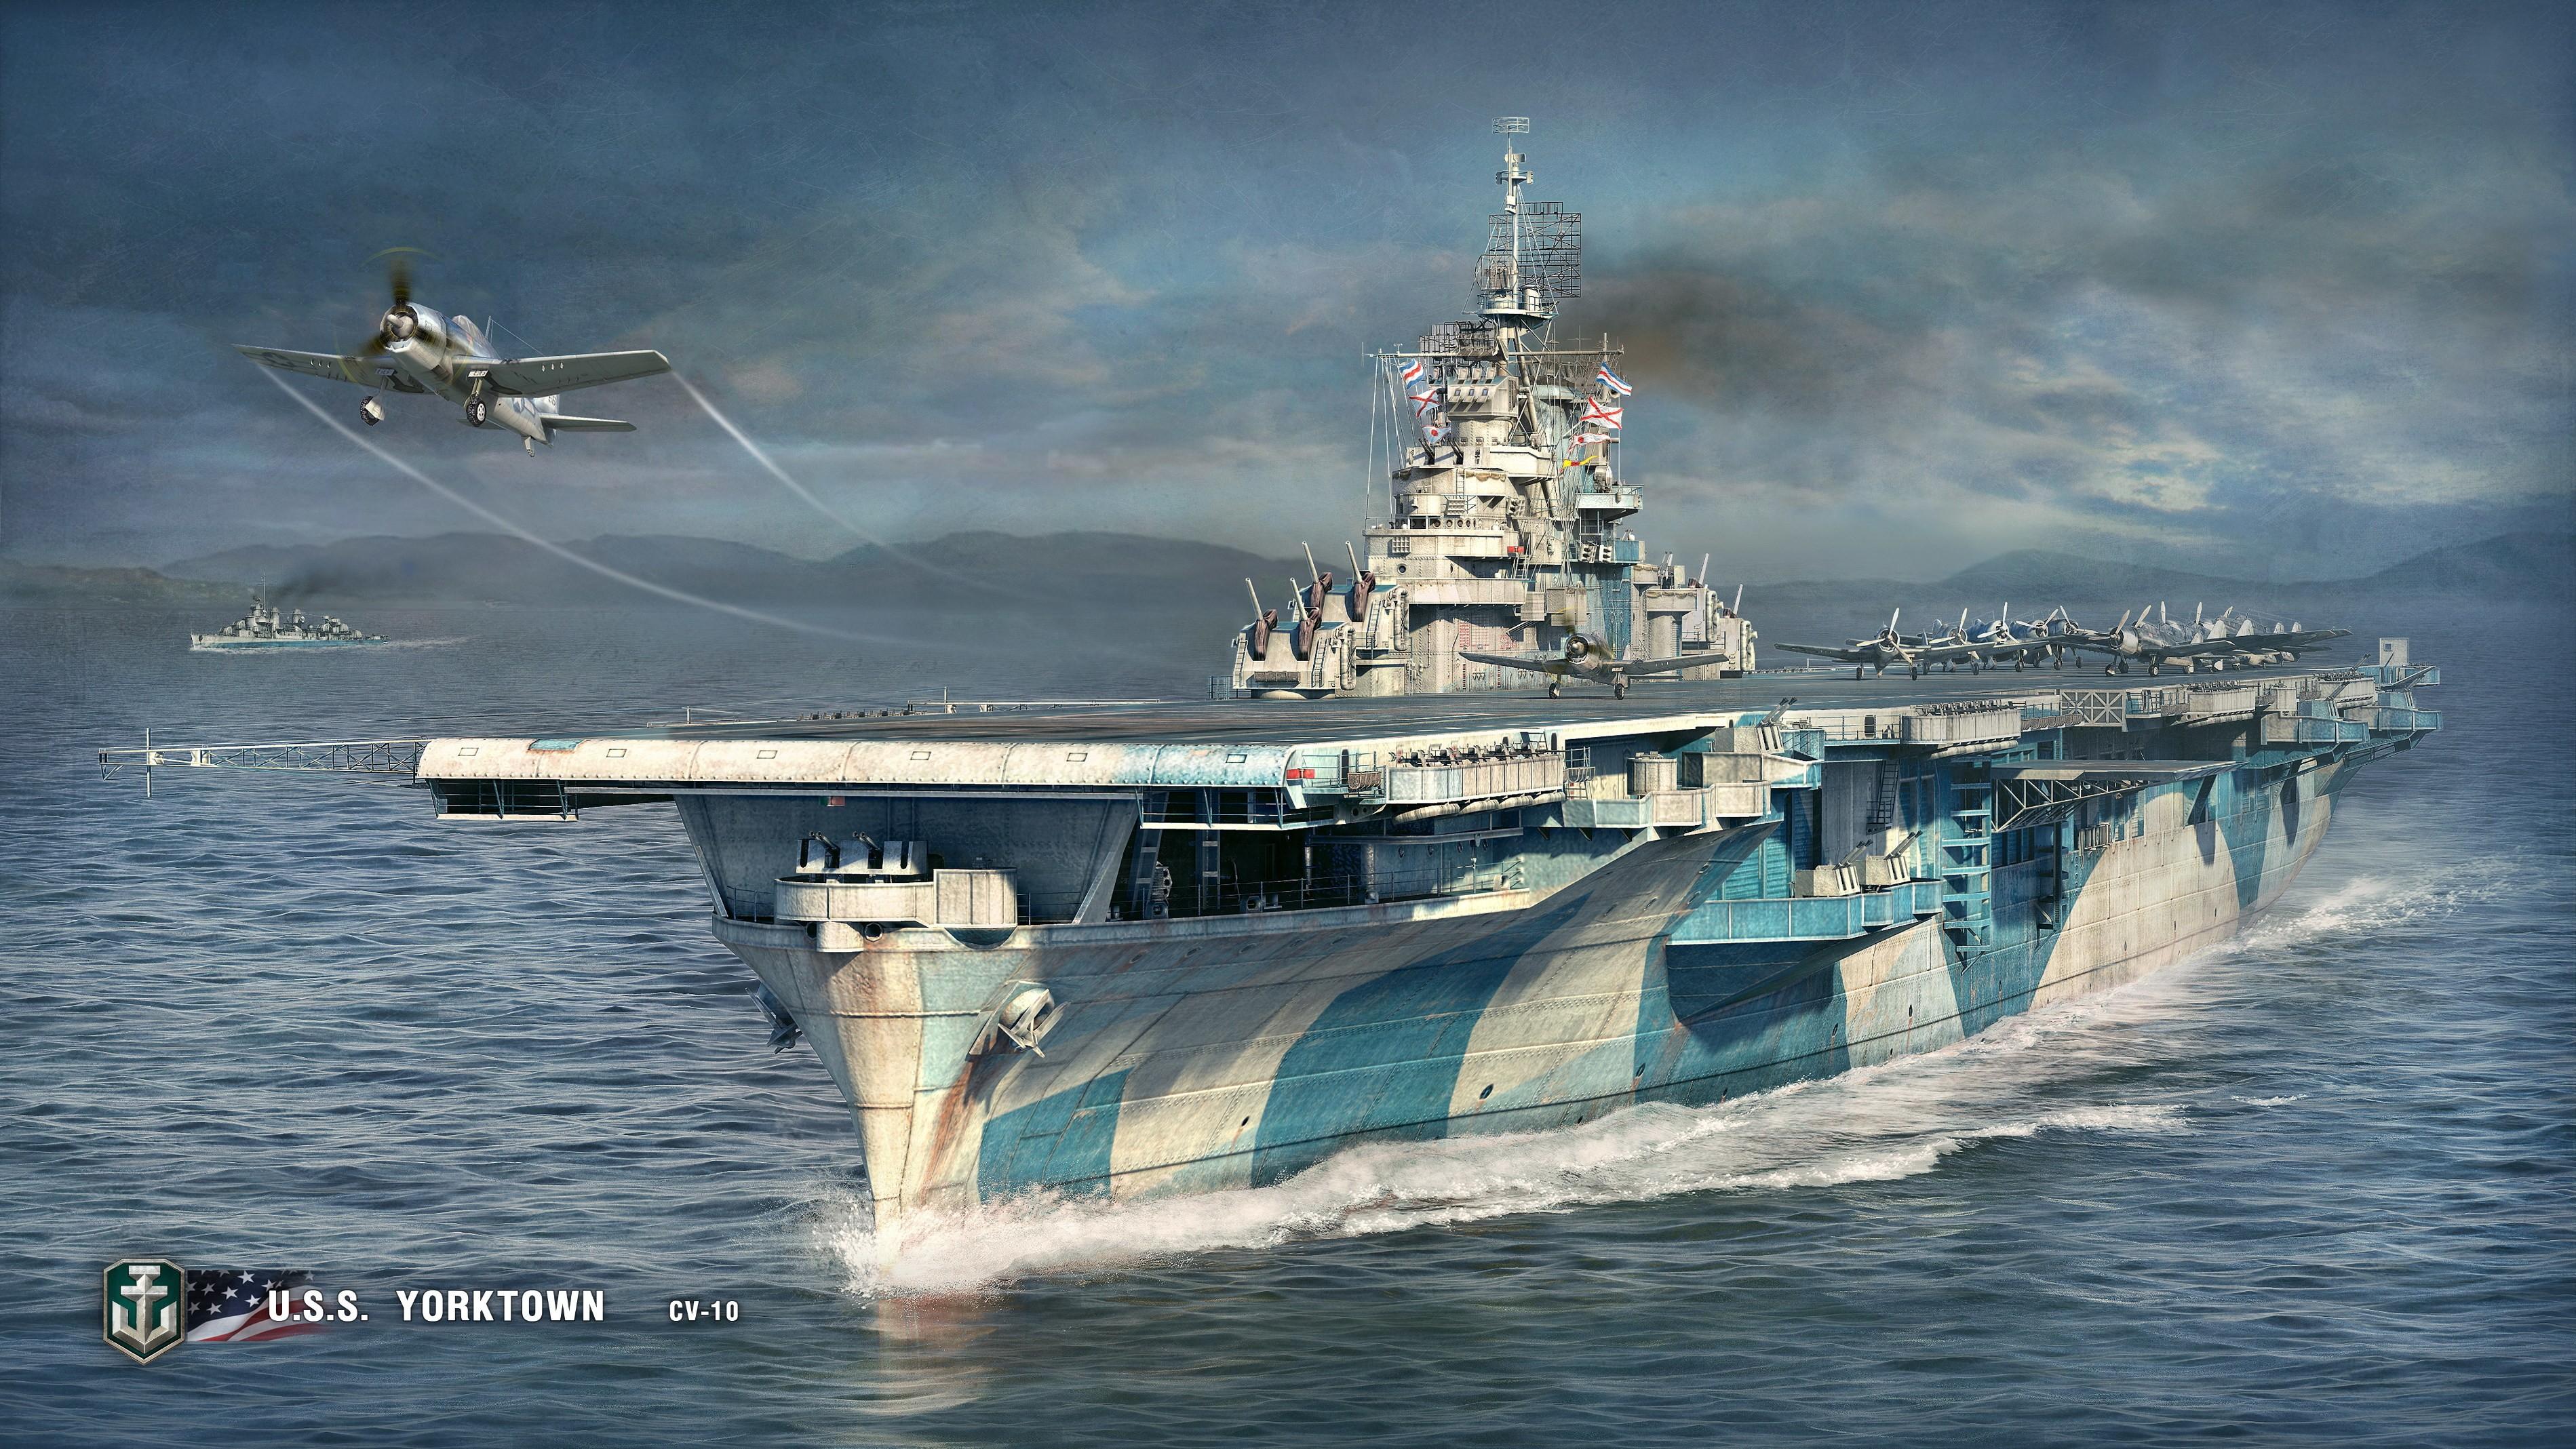 World Of Warships Wallpaper: World Of Warships, Artwork, Video Games, Aircraft Carrier